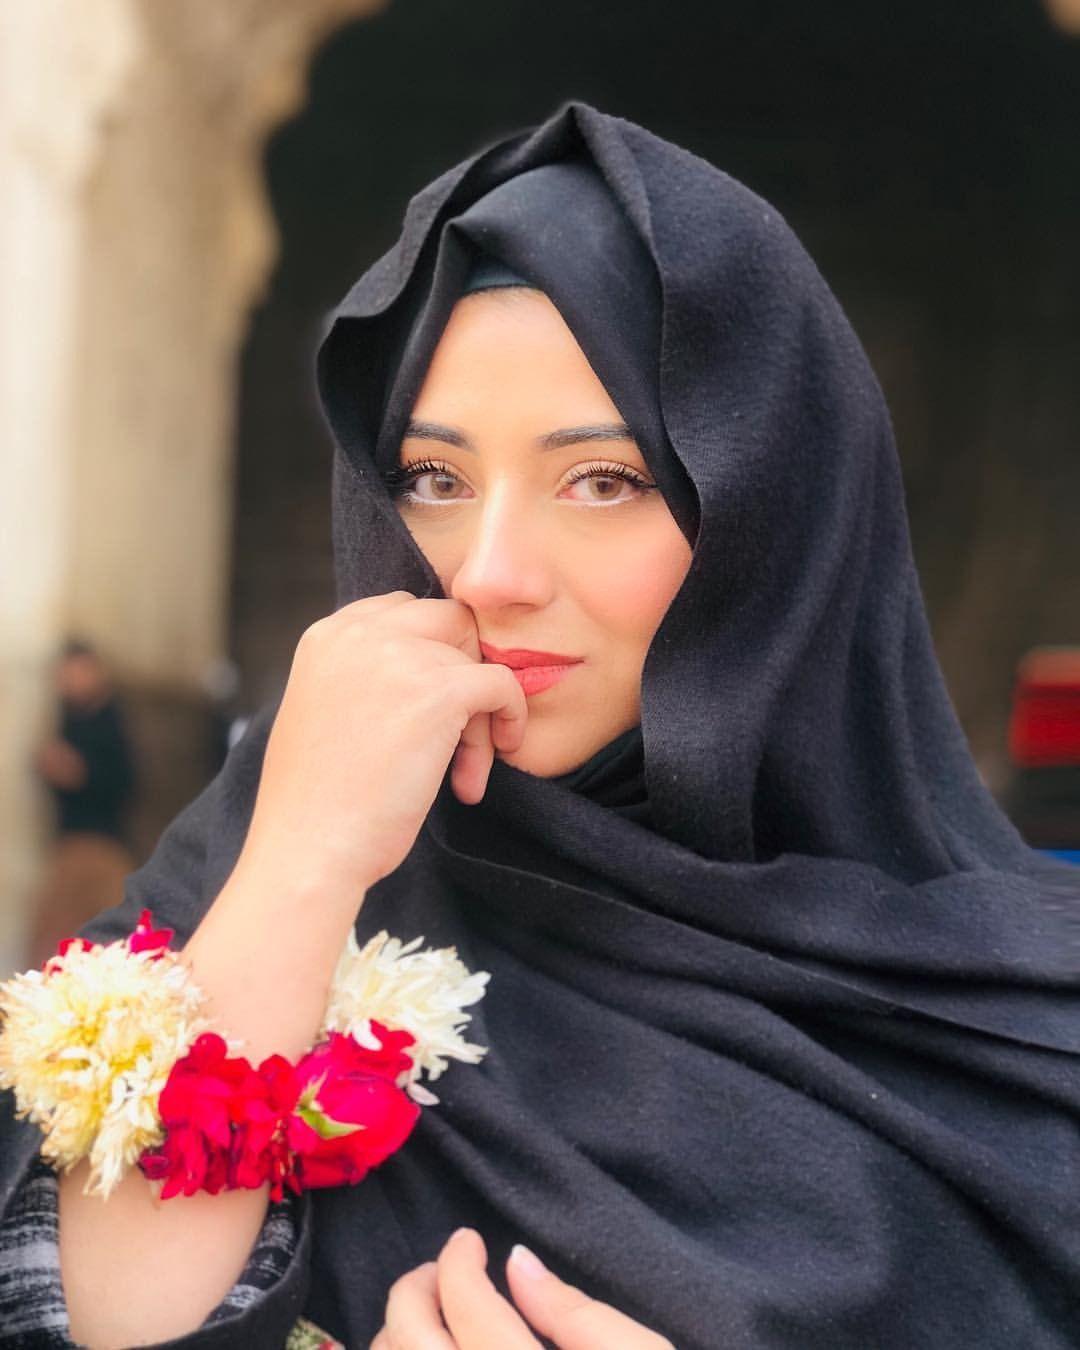 Pin By Mahi Khan On All Girl S Model S Dpz Hijabi Girl Muslim Girls Stylish Dpz